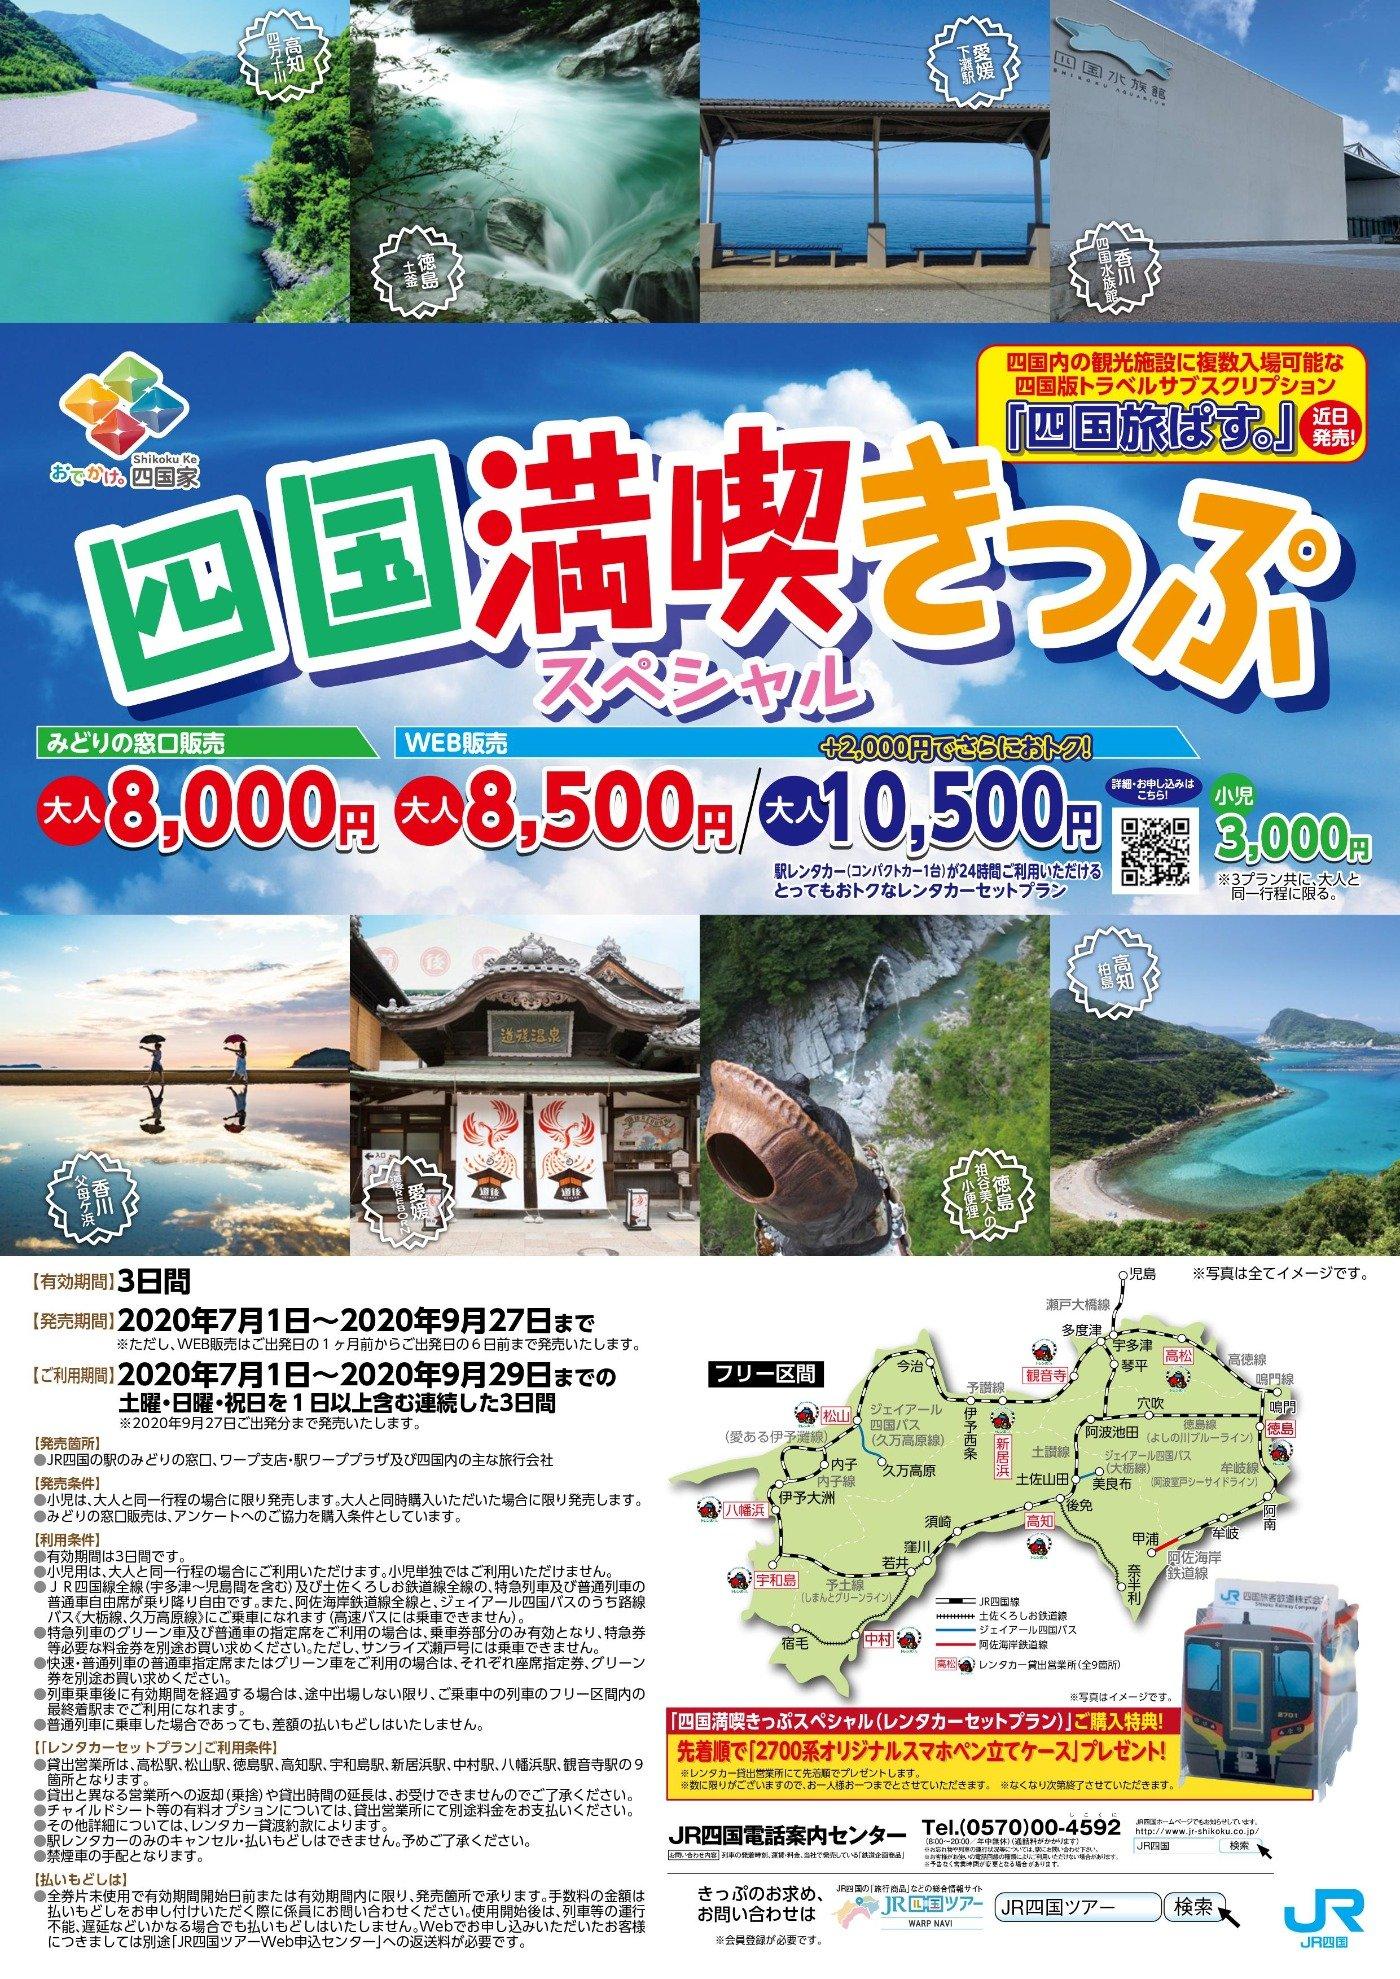 JR四国「四国満喫きっぷスペシャル」